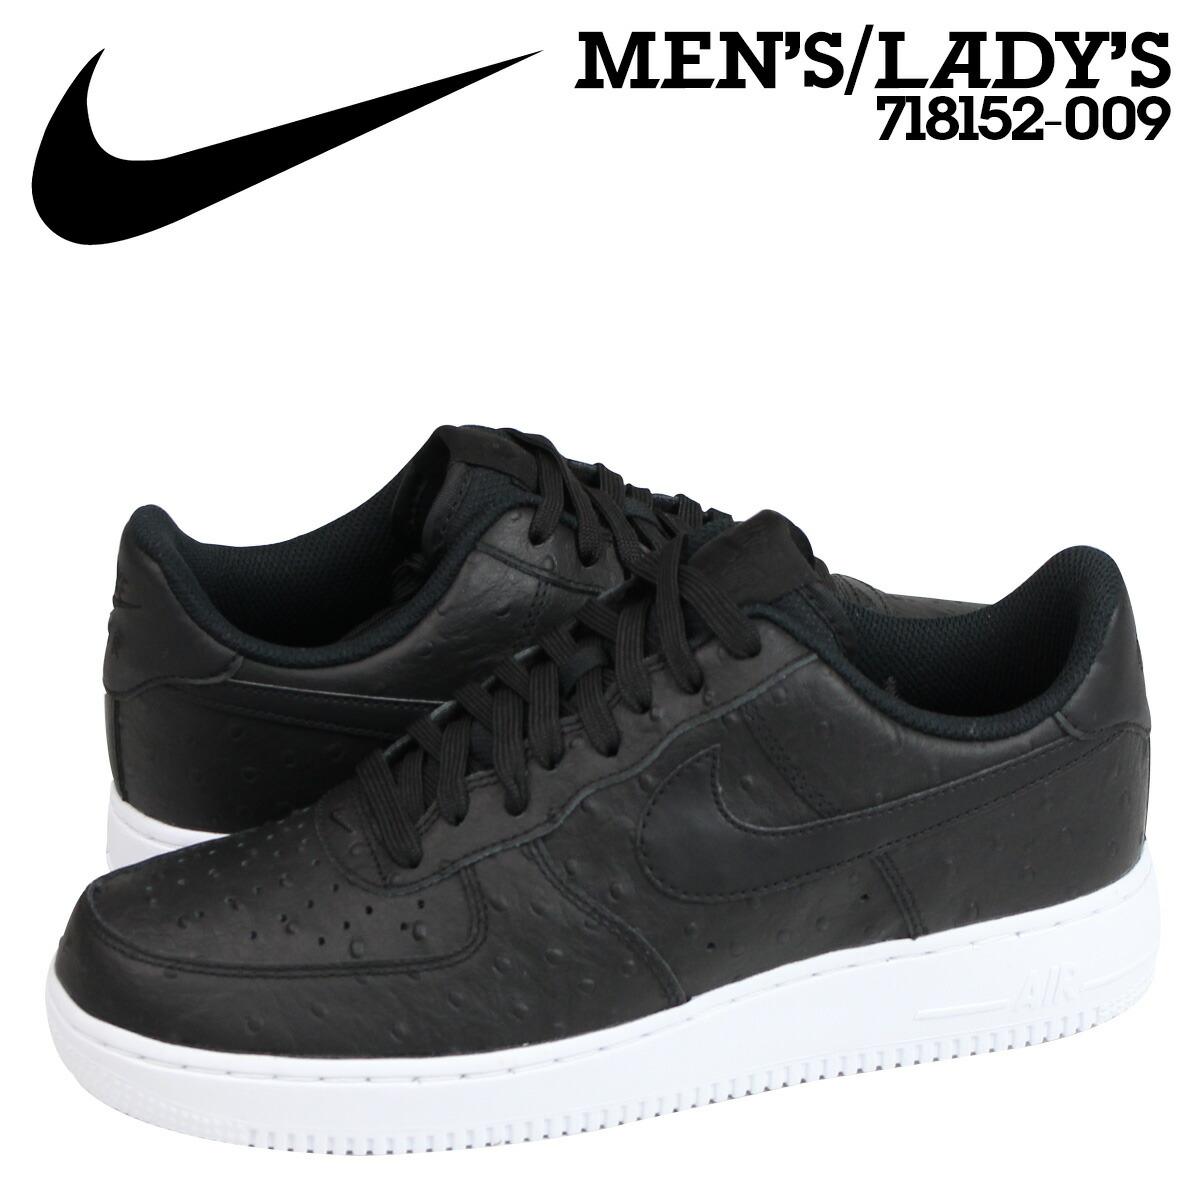 dbf6ed09d6bded ... low price allsports rakuten global market nike nike air force sneakers  air force 1 07 lv8